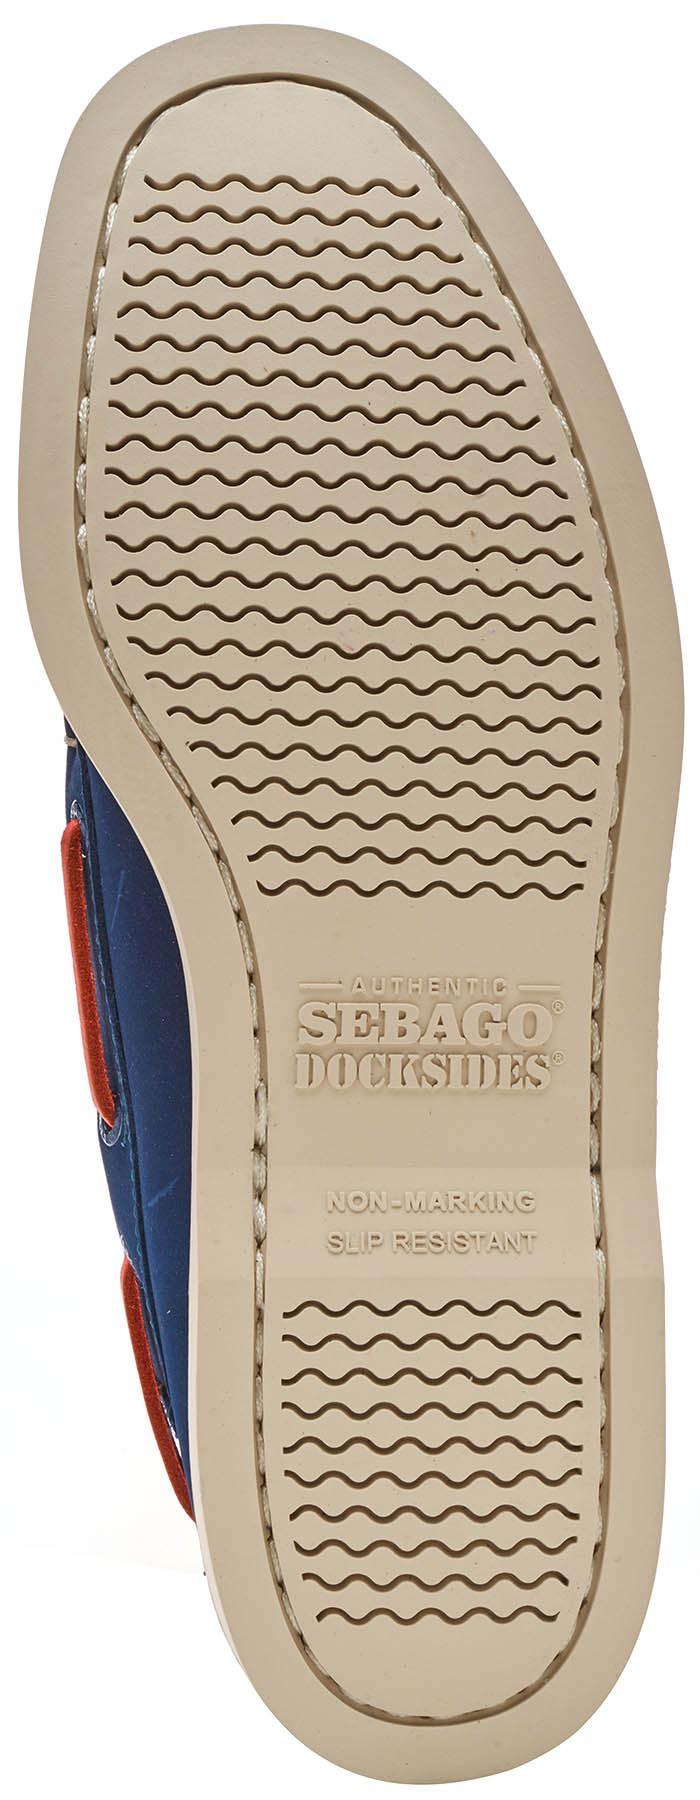 Sebago-Docksides-NBK-Suede-Boat-Deck-Shoes-in-Navy-Blue-amp-Coral-amp-Dark-Brown thumbnail 33